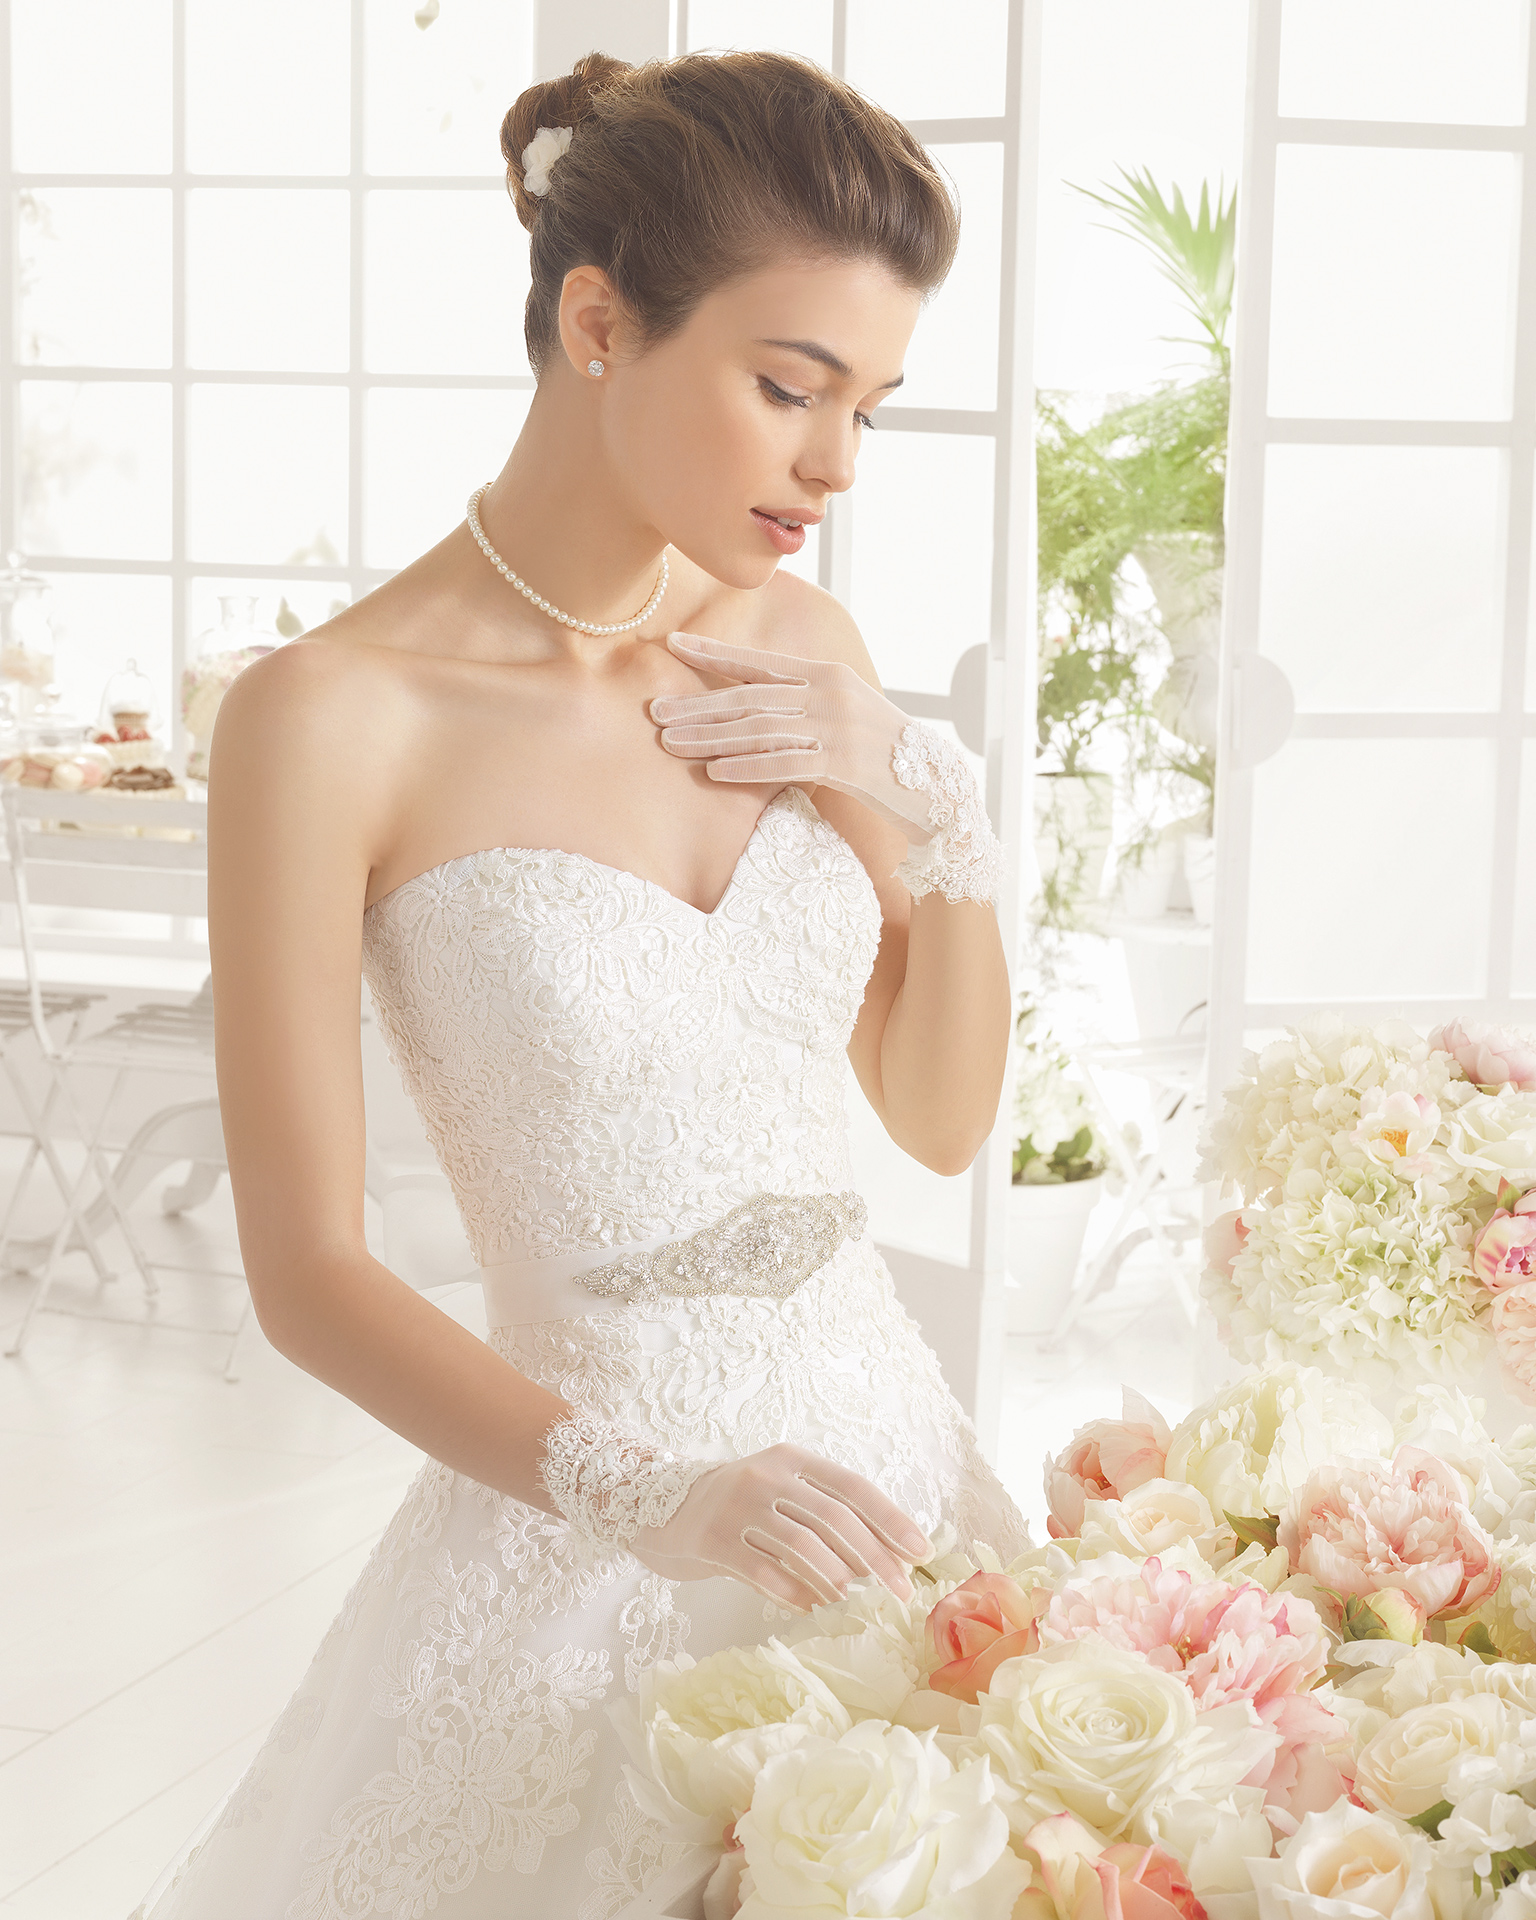 MIXTO beaded guipure wedding dress.